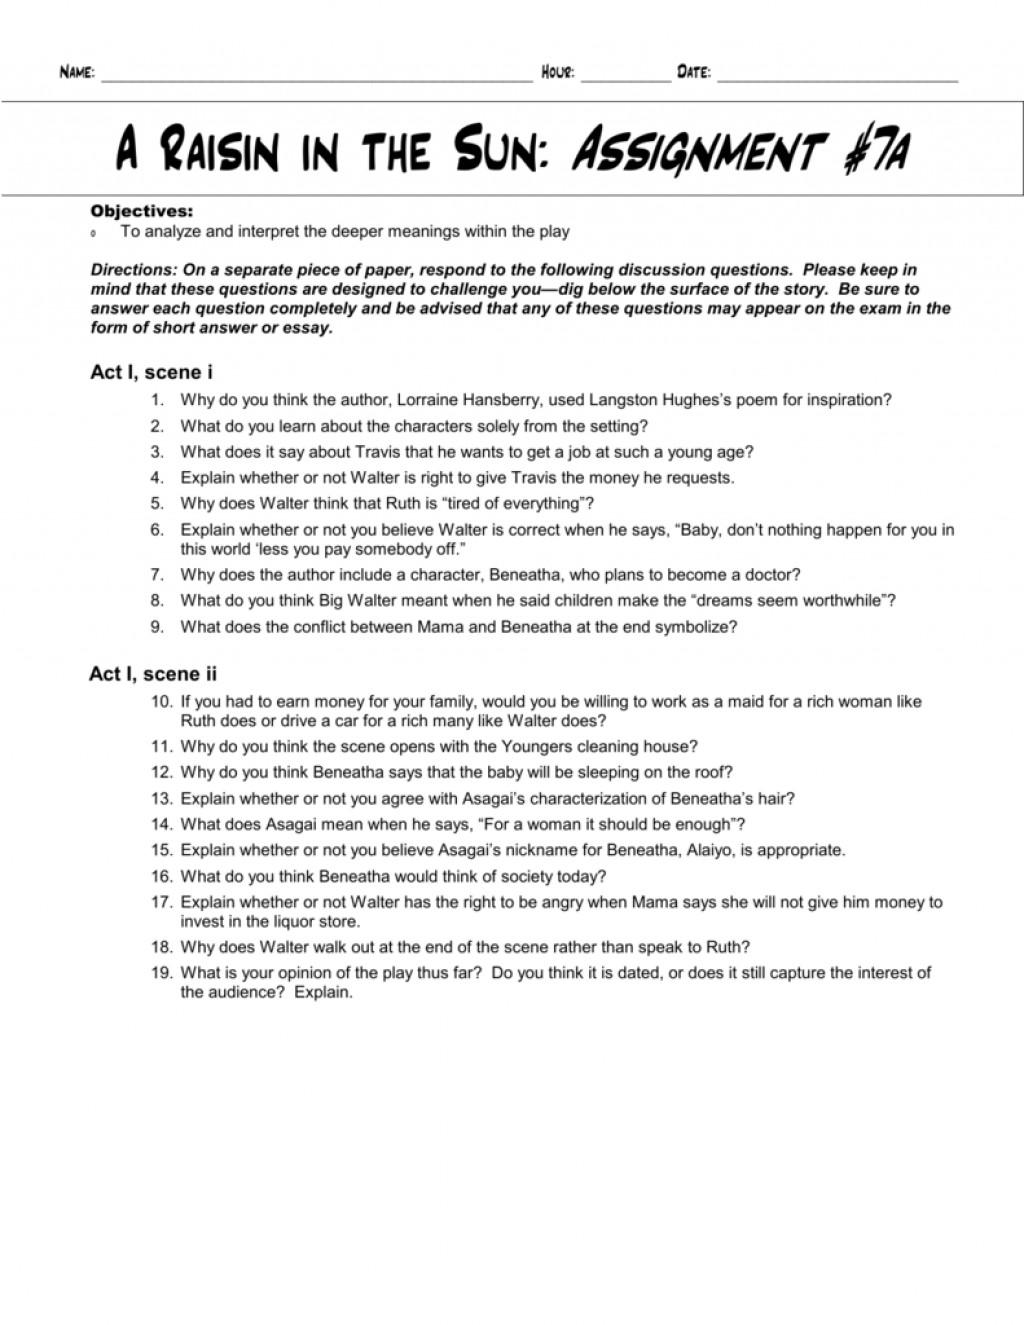 003 Raisin In The Sun Themes Essay 008718600 1 Beautiful A Theme Analysis Large